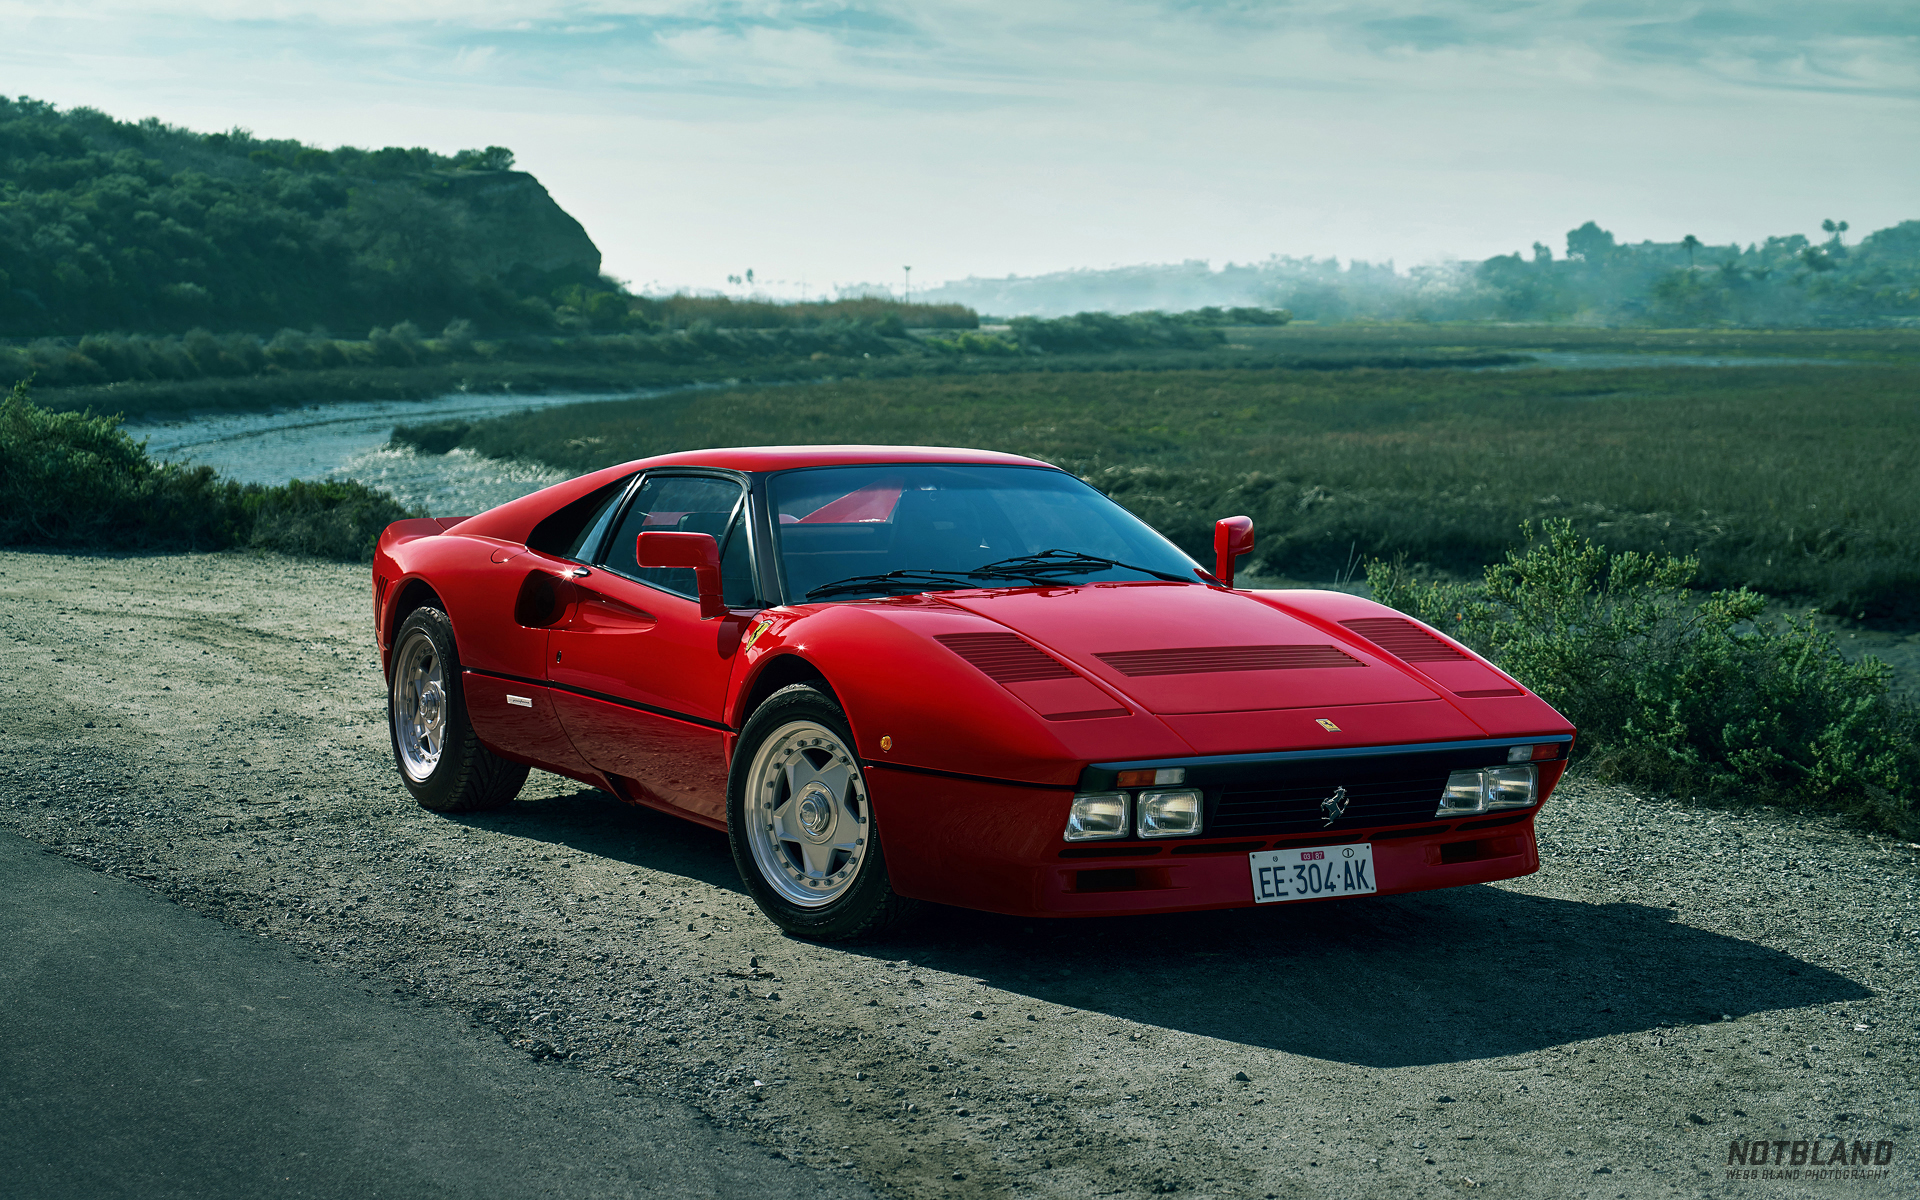 Ferrari 288 GTO Wallpapers